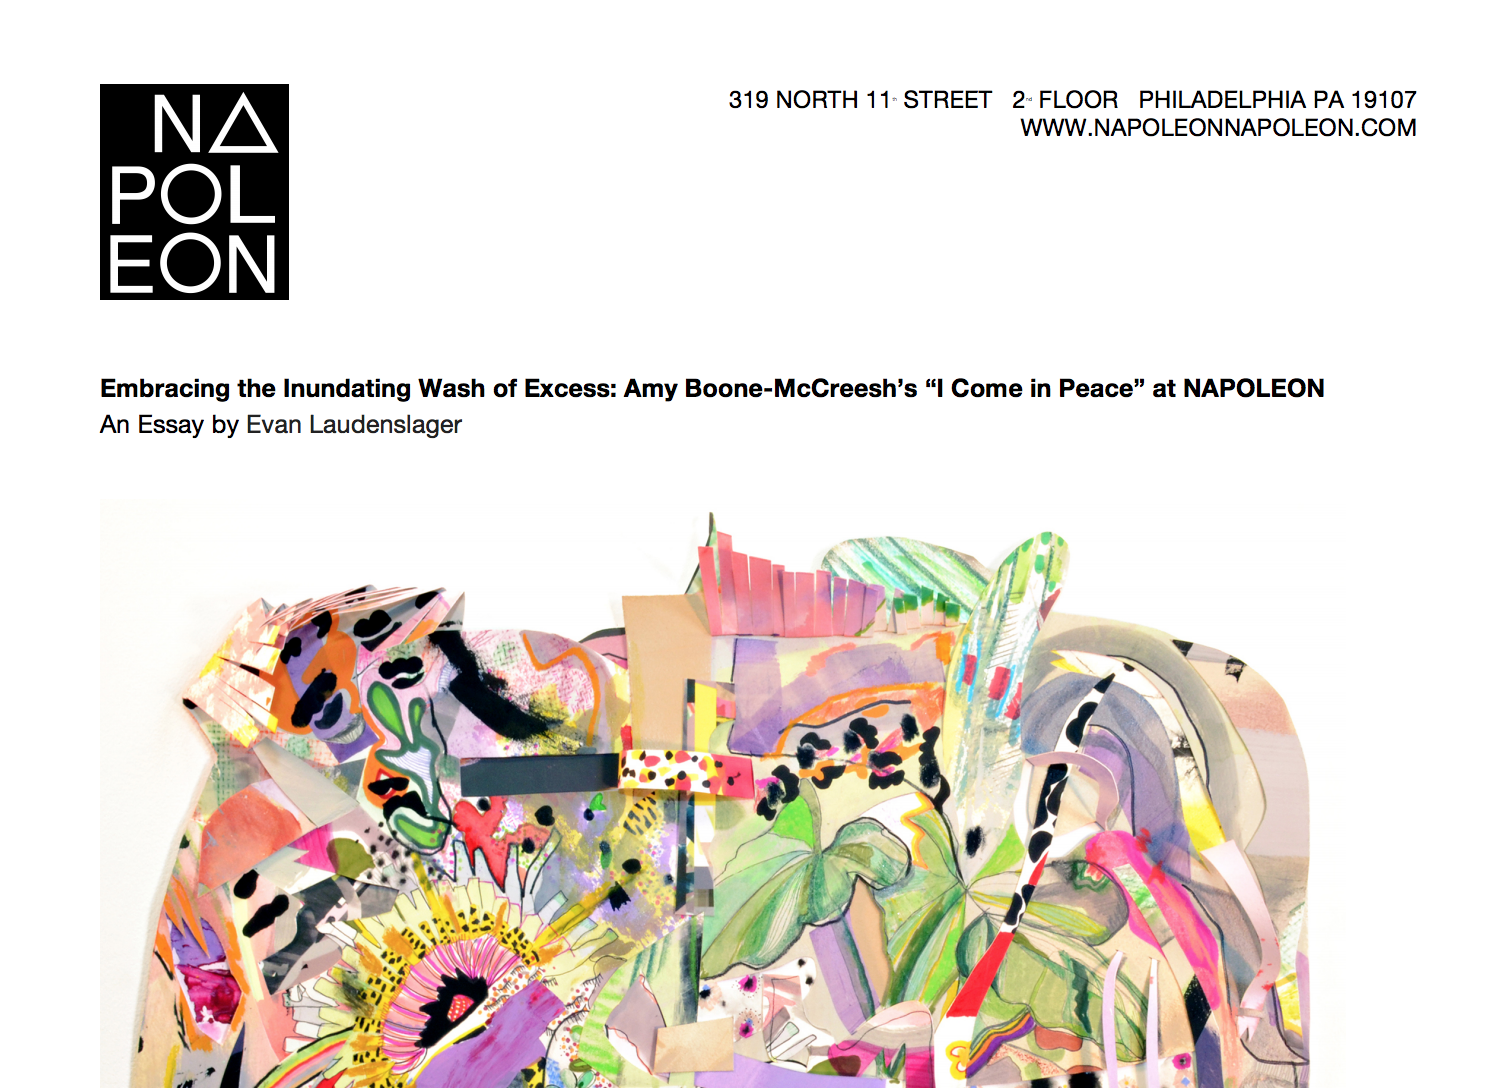 Essay for solo-exhibition at Napoleon Gallery, Phildelphia -